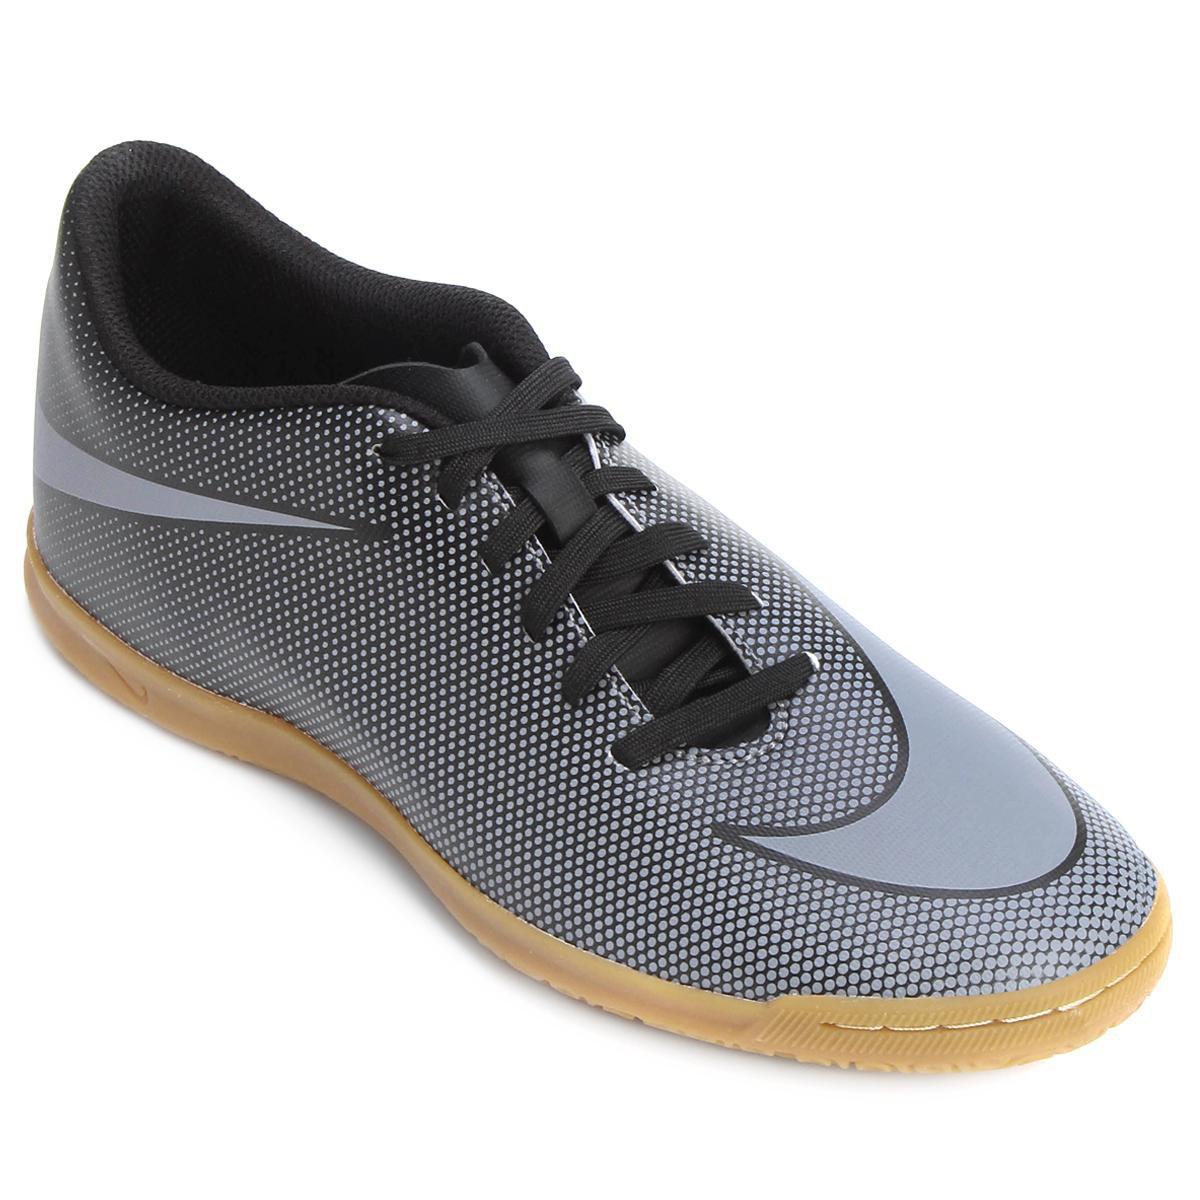 ac1a6fe9304 Chuteira Futsal Nike Bravata 2 IC - Compre Agora